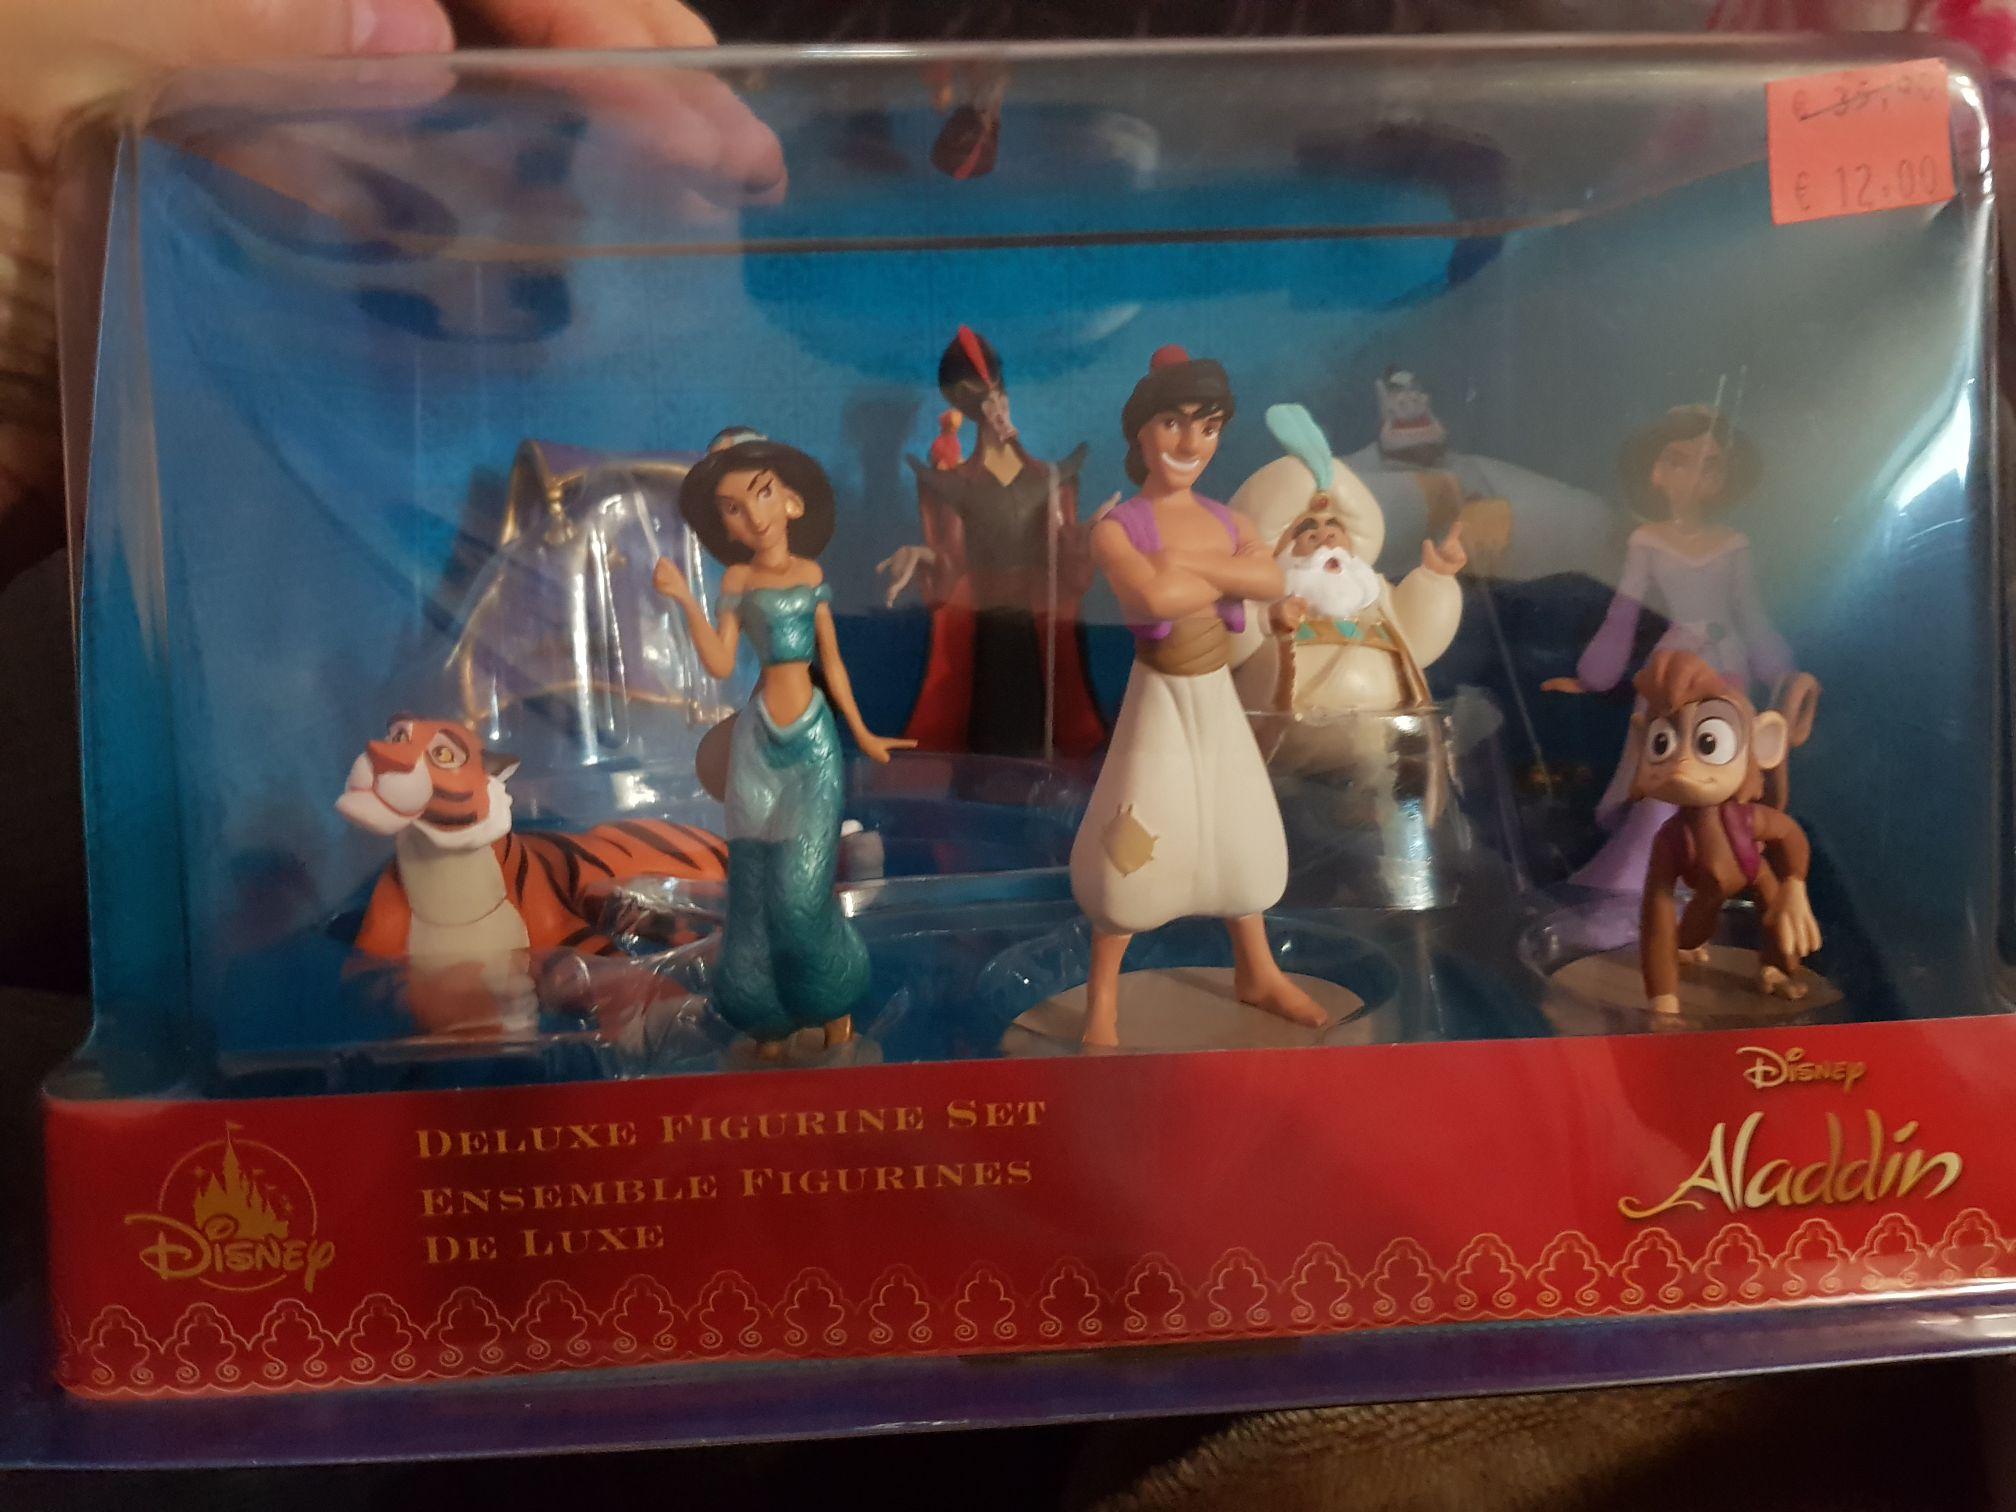 Figura Aladdin (Tienda Disney del centro comercial intuxanadu)